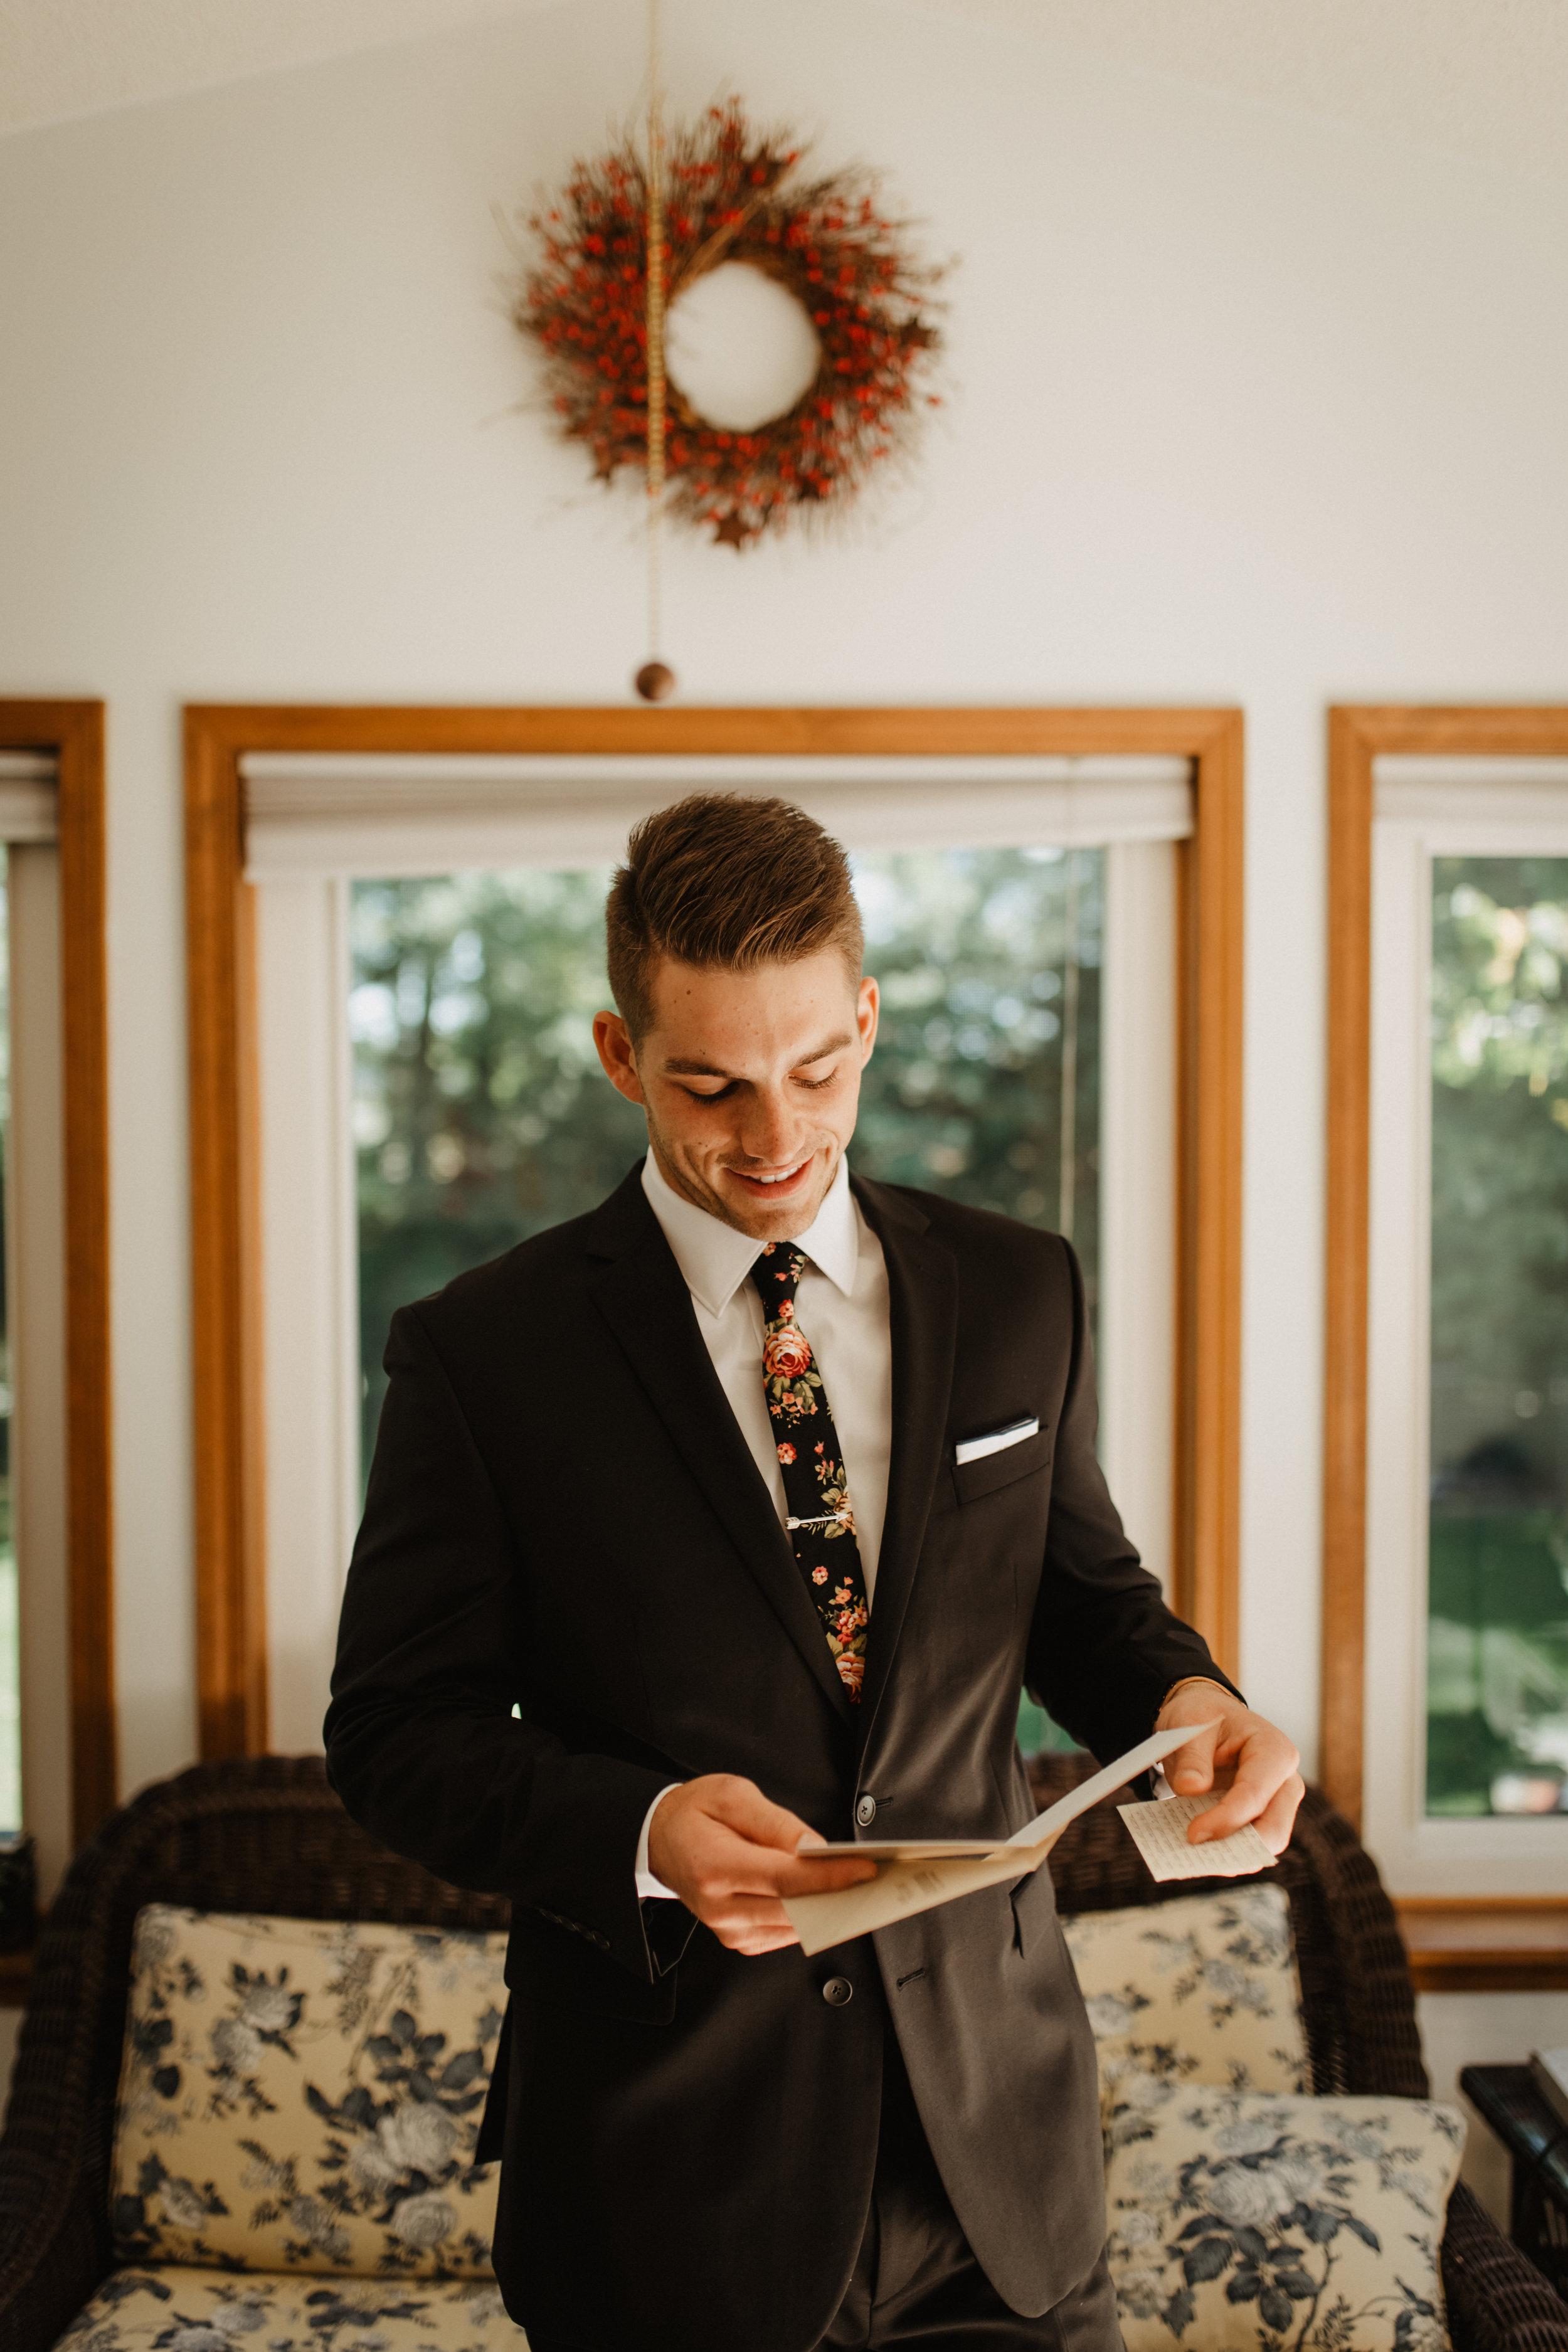 Groom-Wedding-Letter-Photo-02